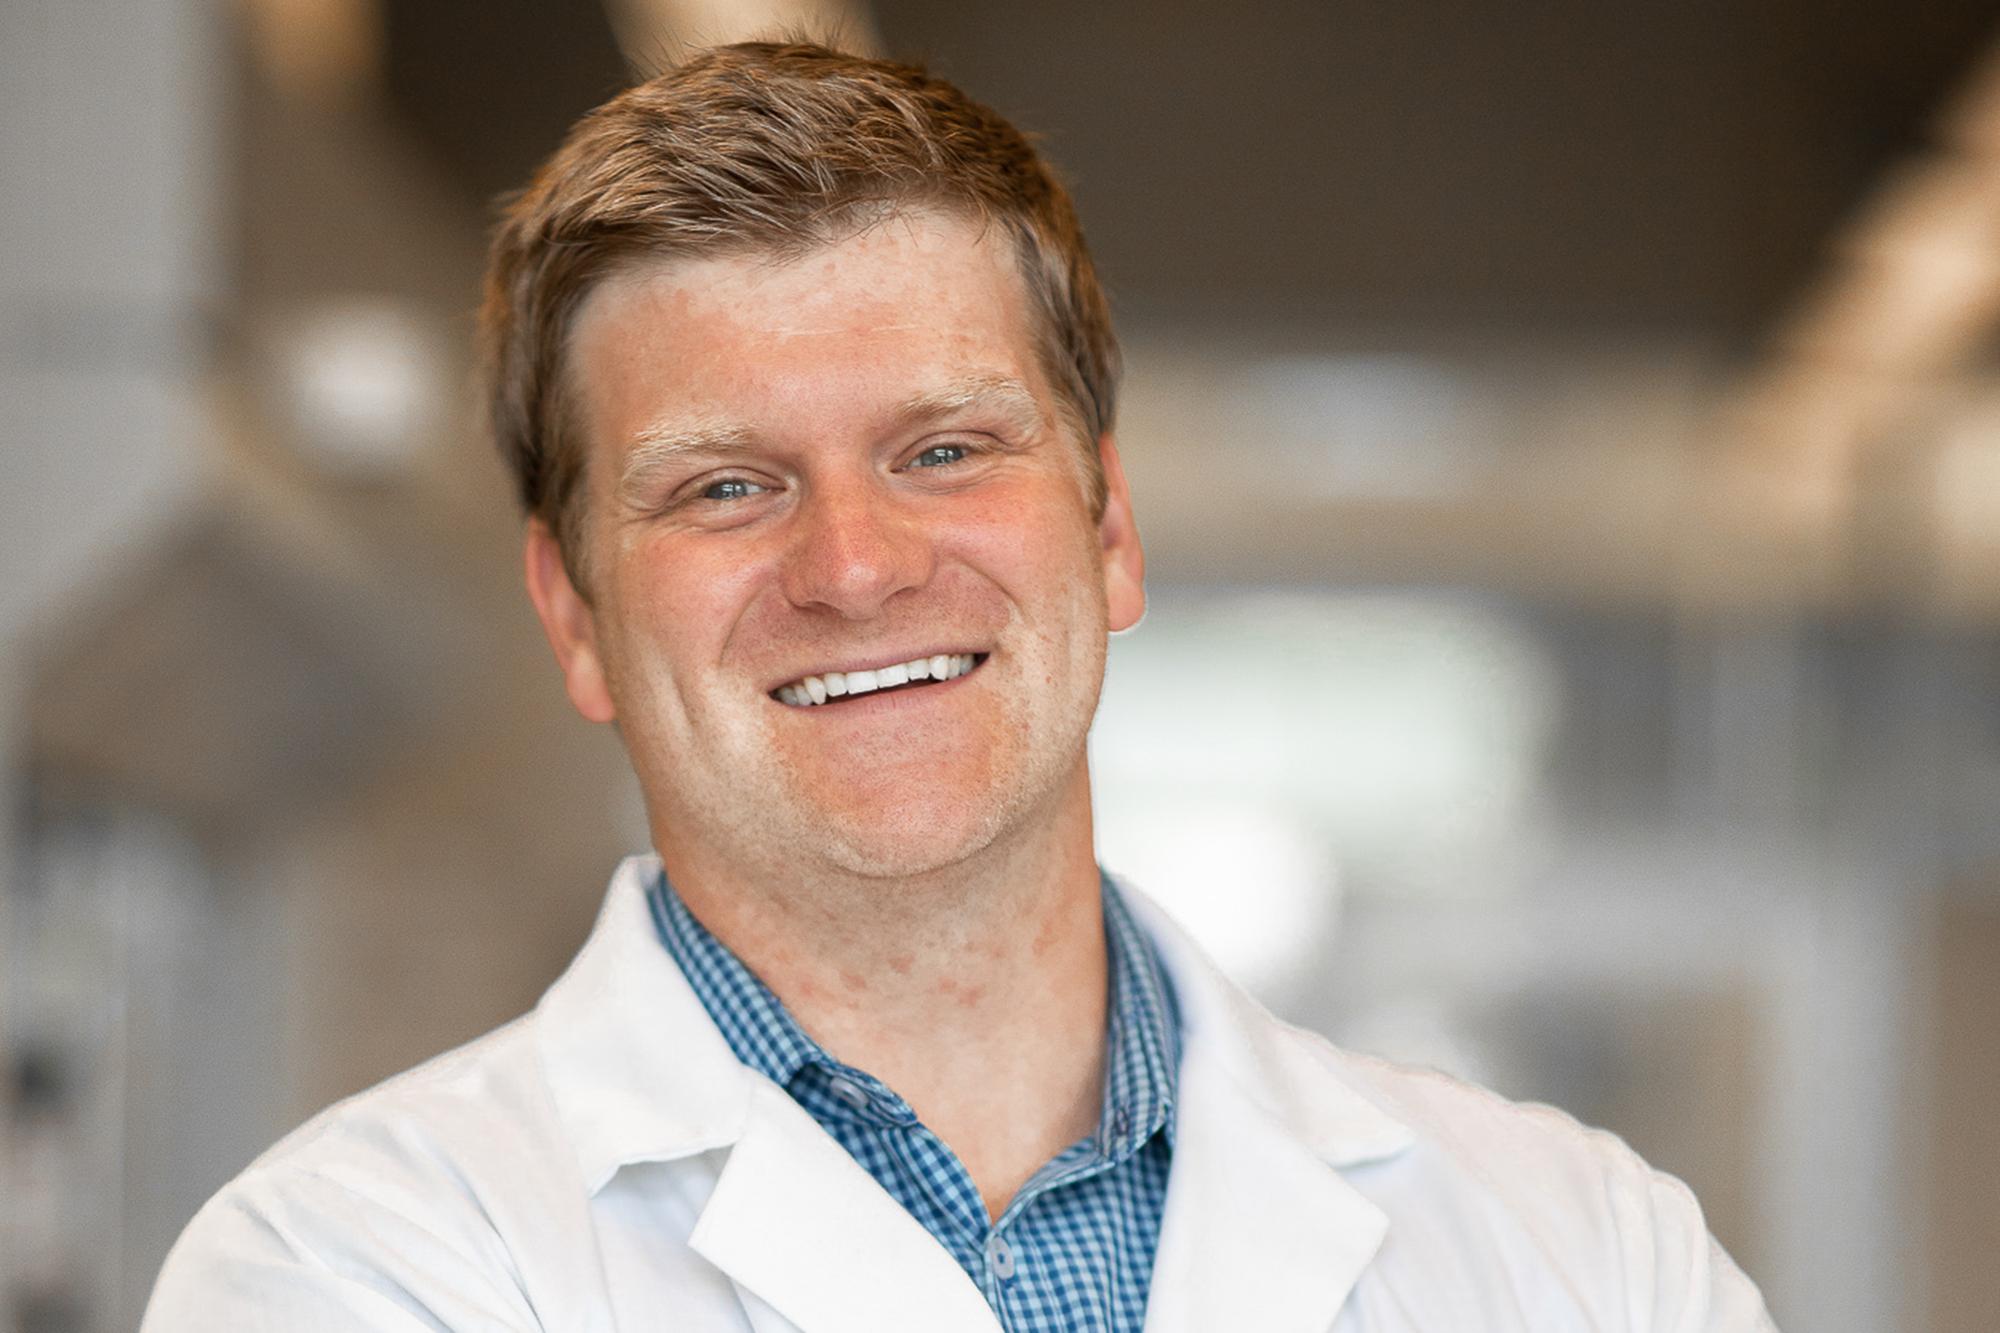 Brett Van Veller, assistant chemistry professor and principal investigator of the VanVeller Lab